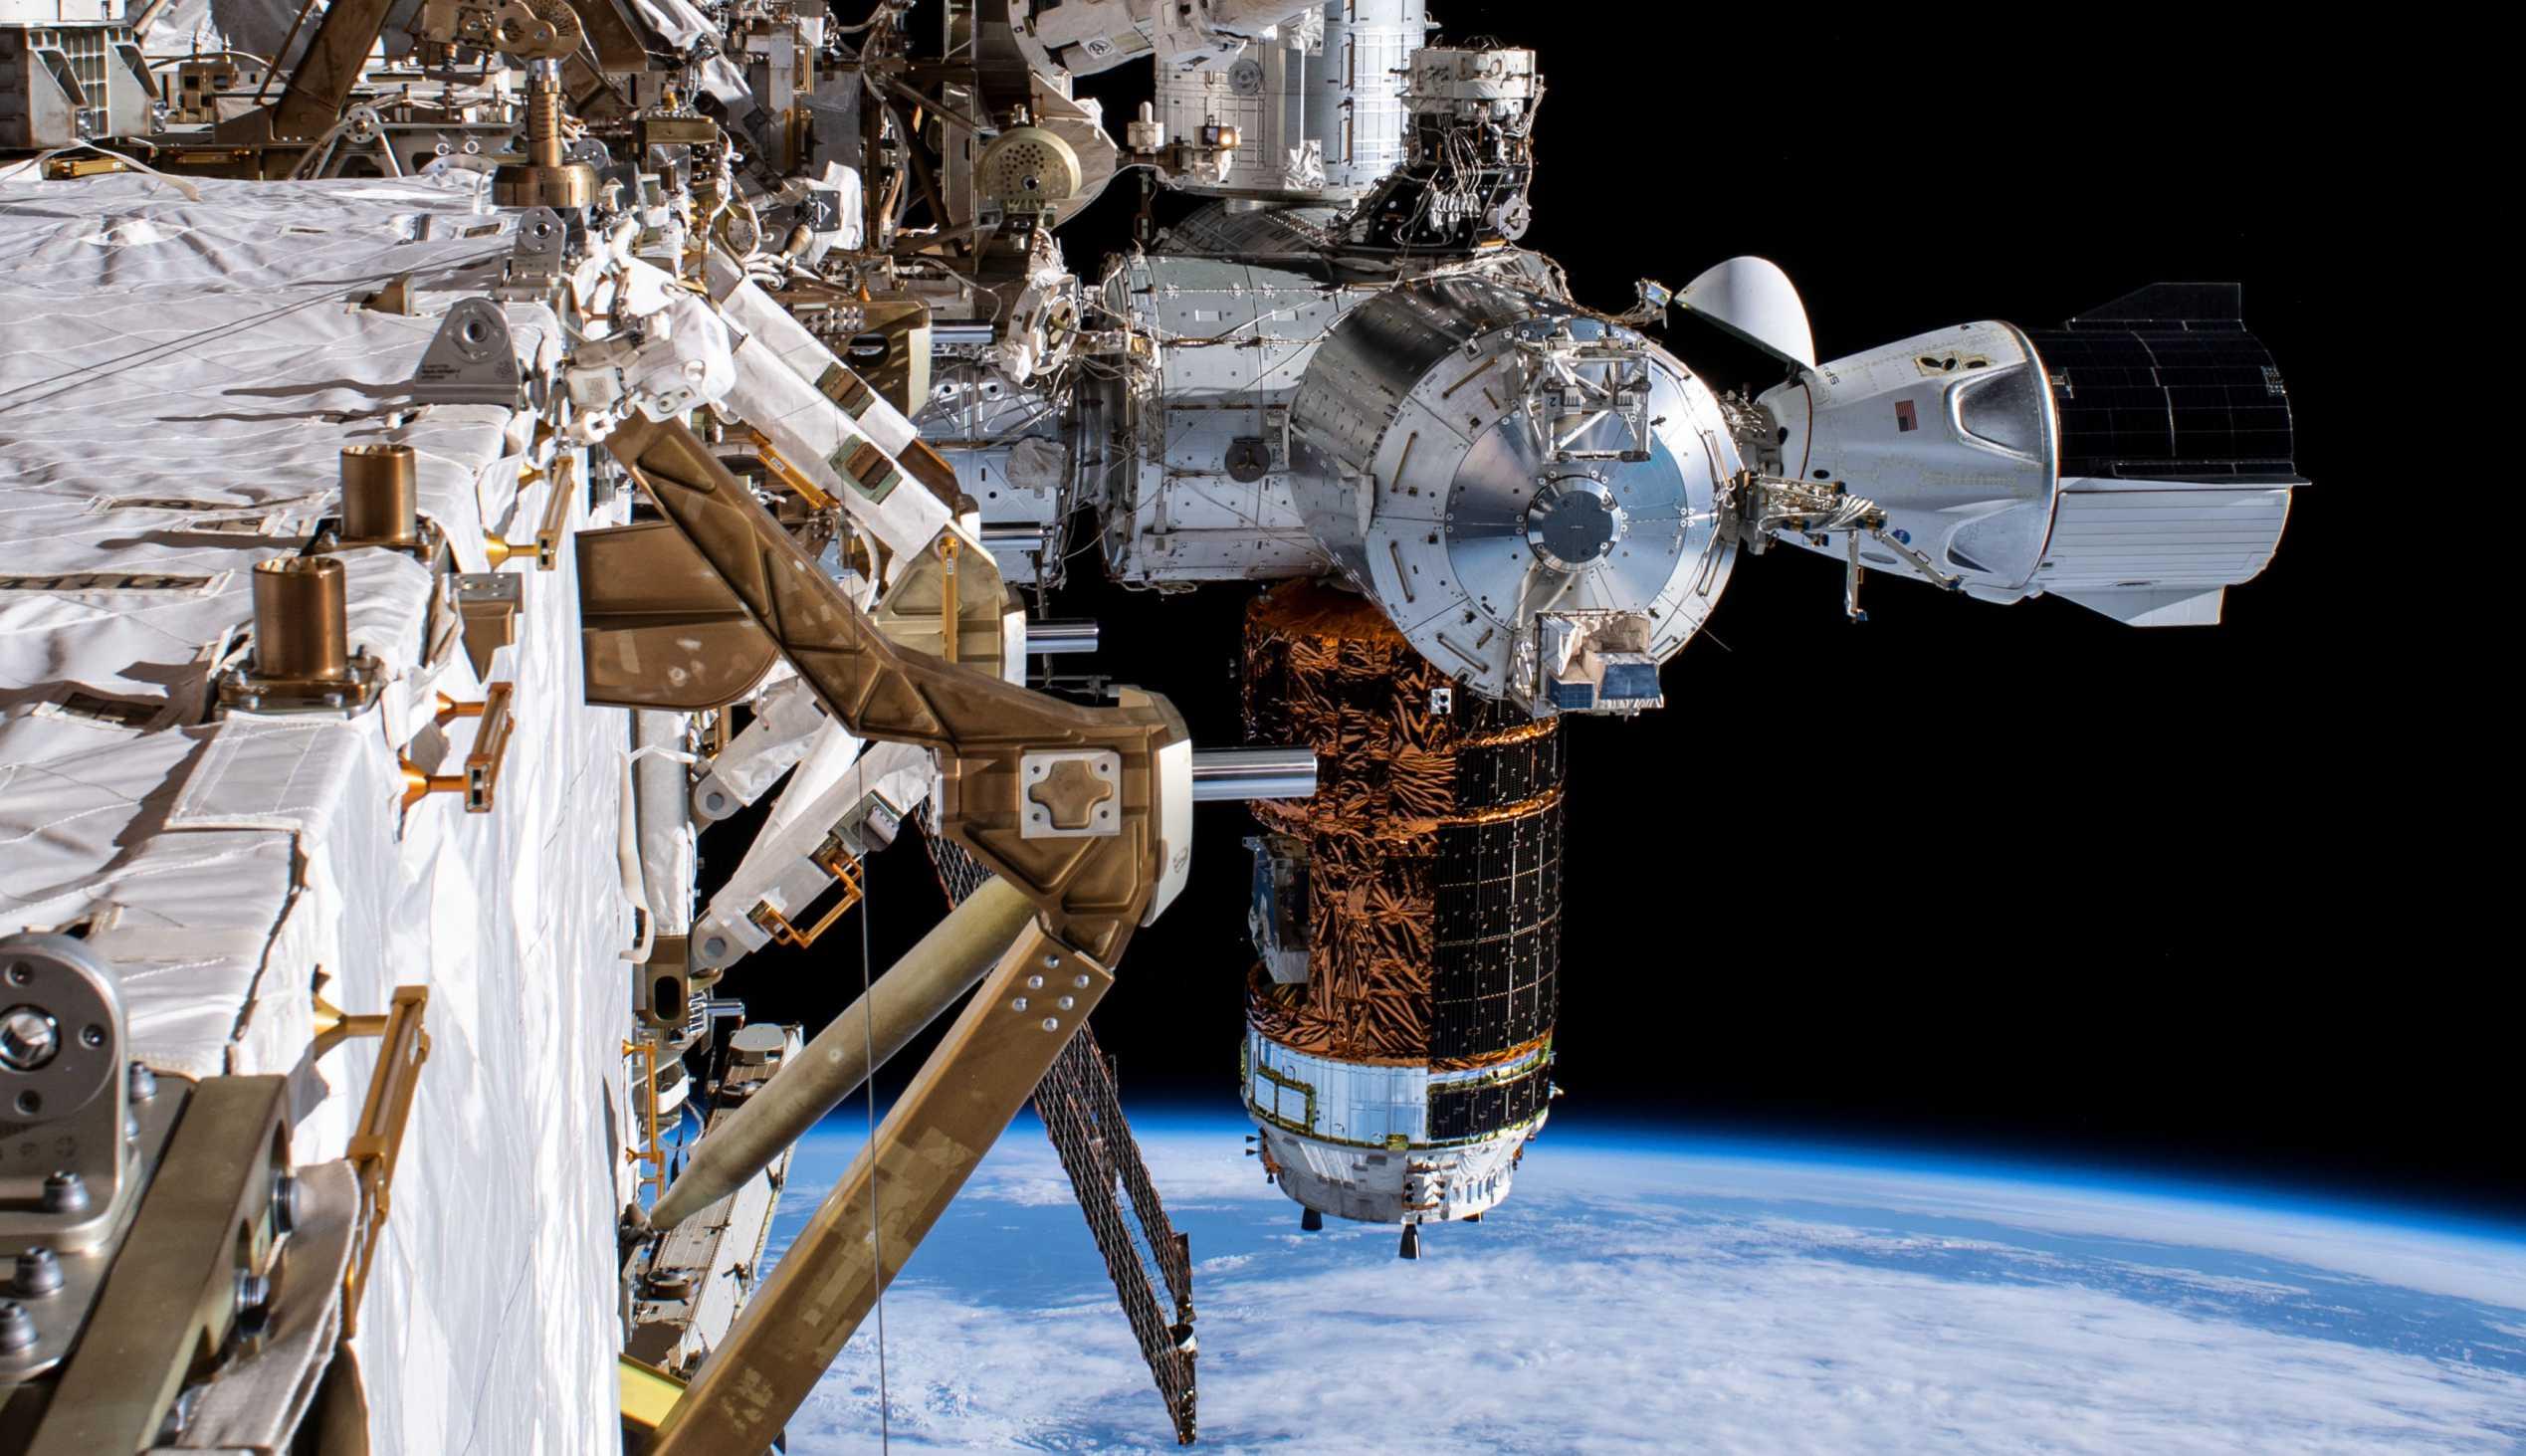 SpaceX Crew Dragon C206 Demo-2 ISS spacewalk 070120 (NASA) 3 crop 1 (c)